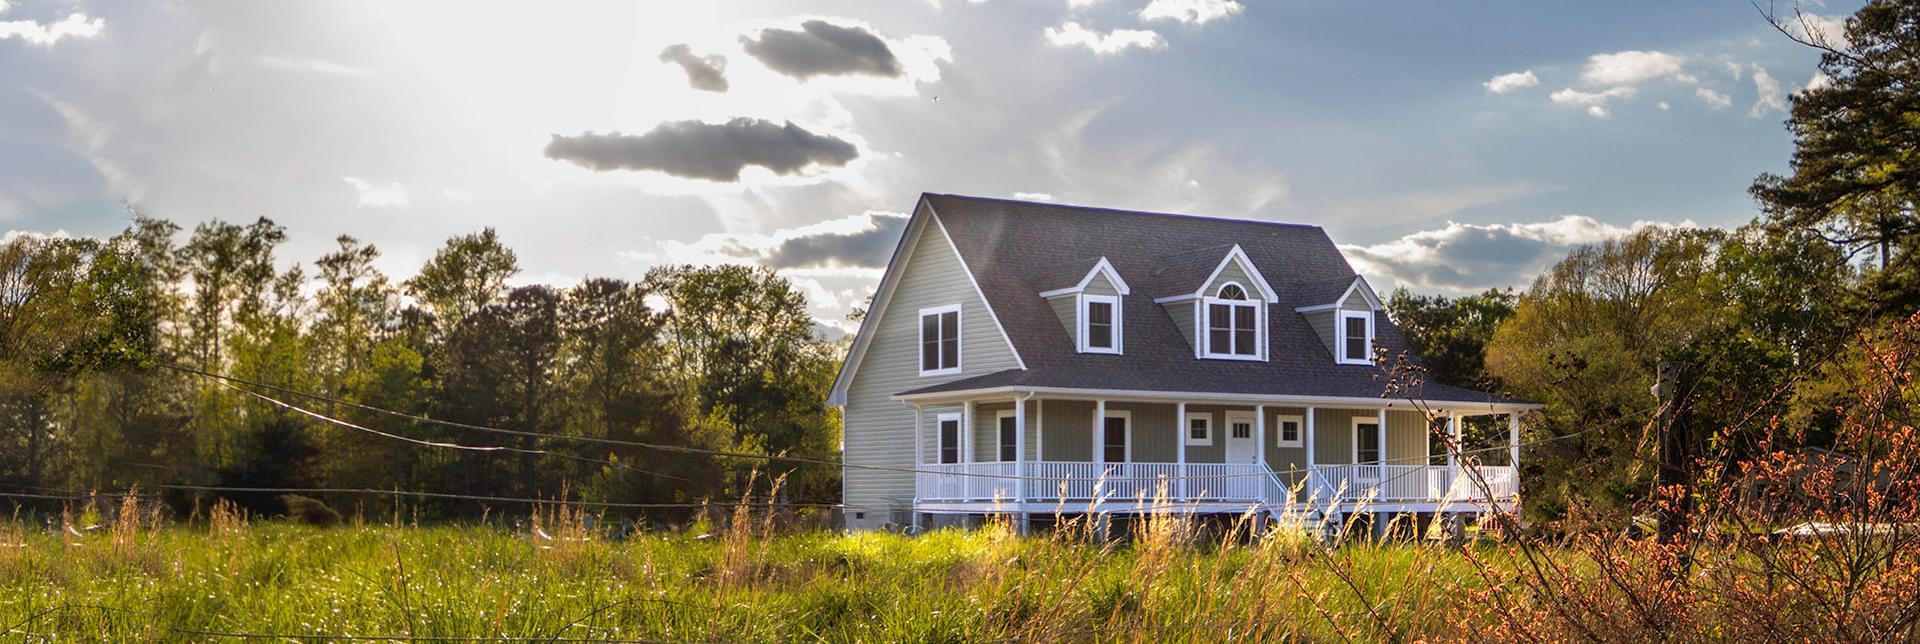 New Homes in Frederick County VA